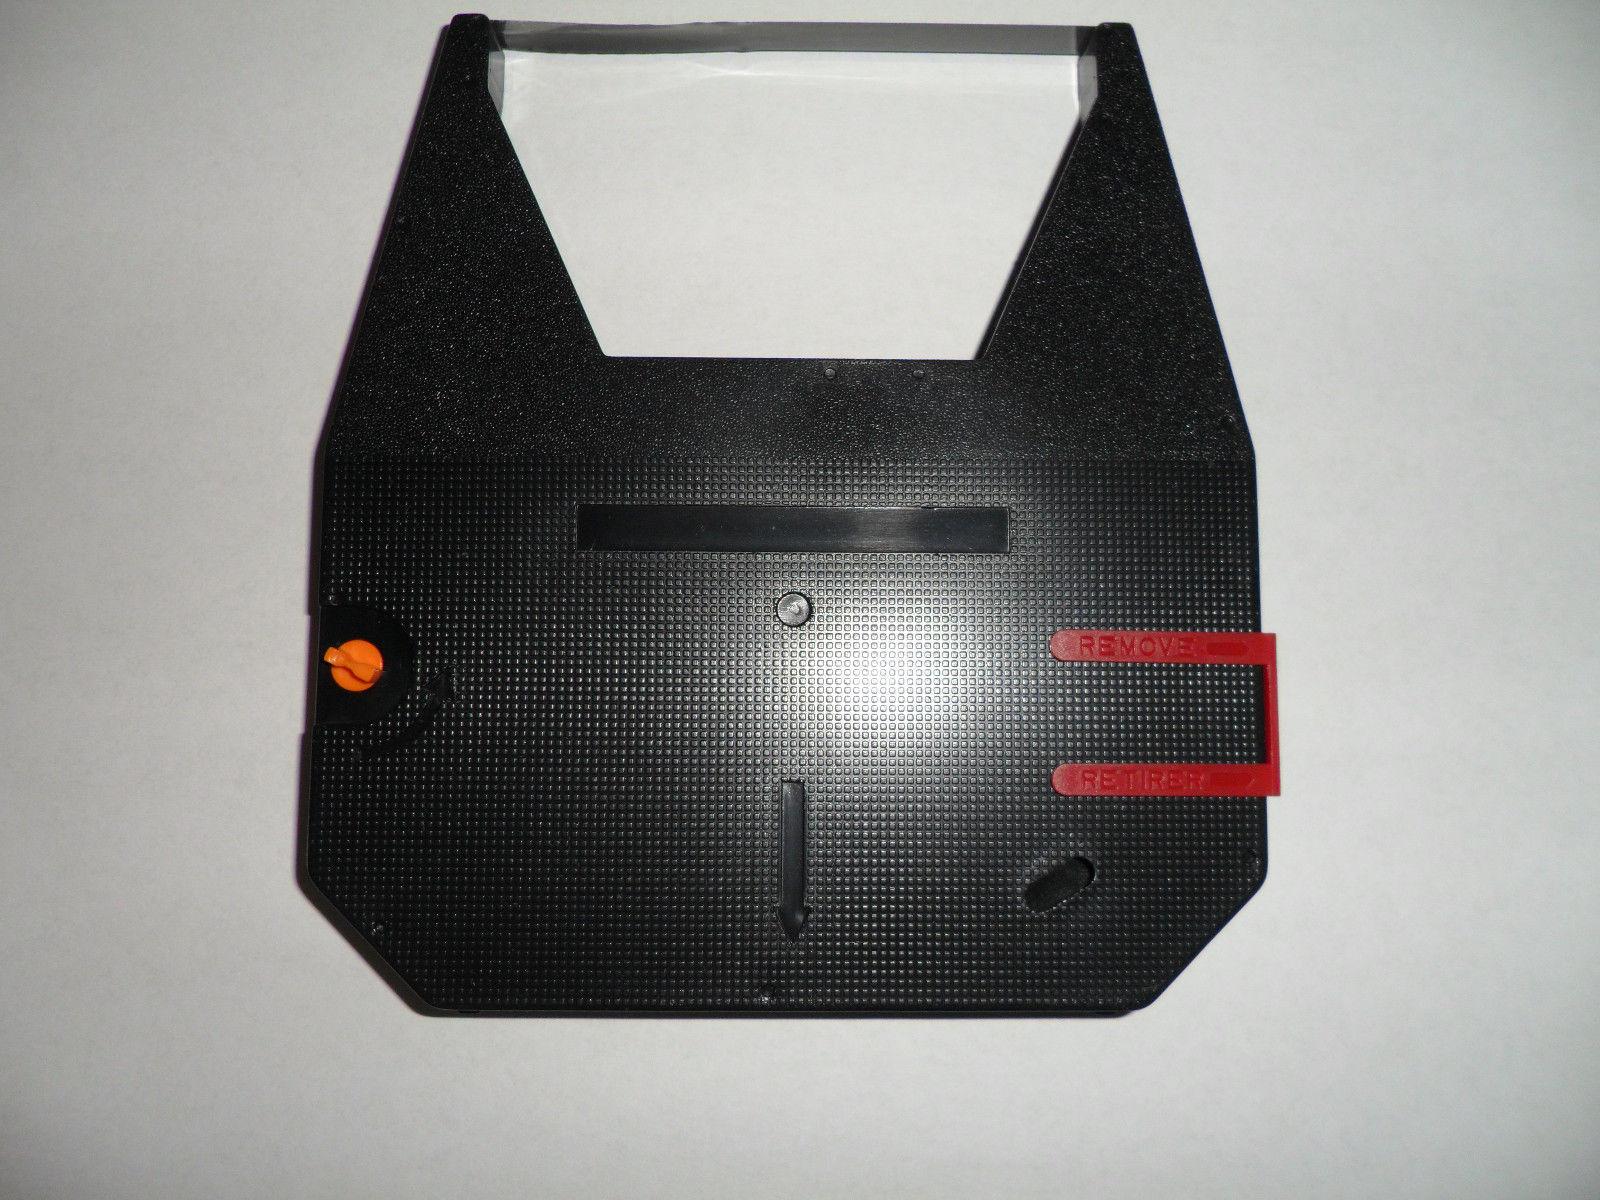 Brother EM530/EM550/EM630 Typewriter Ribbon Replaces 7020 B165 T330